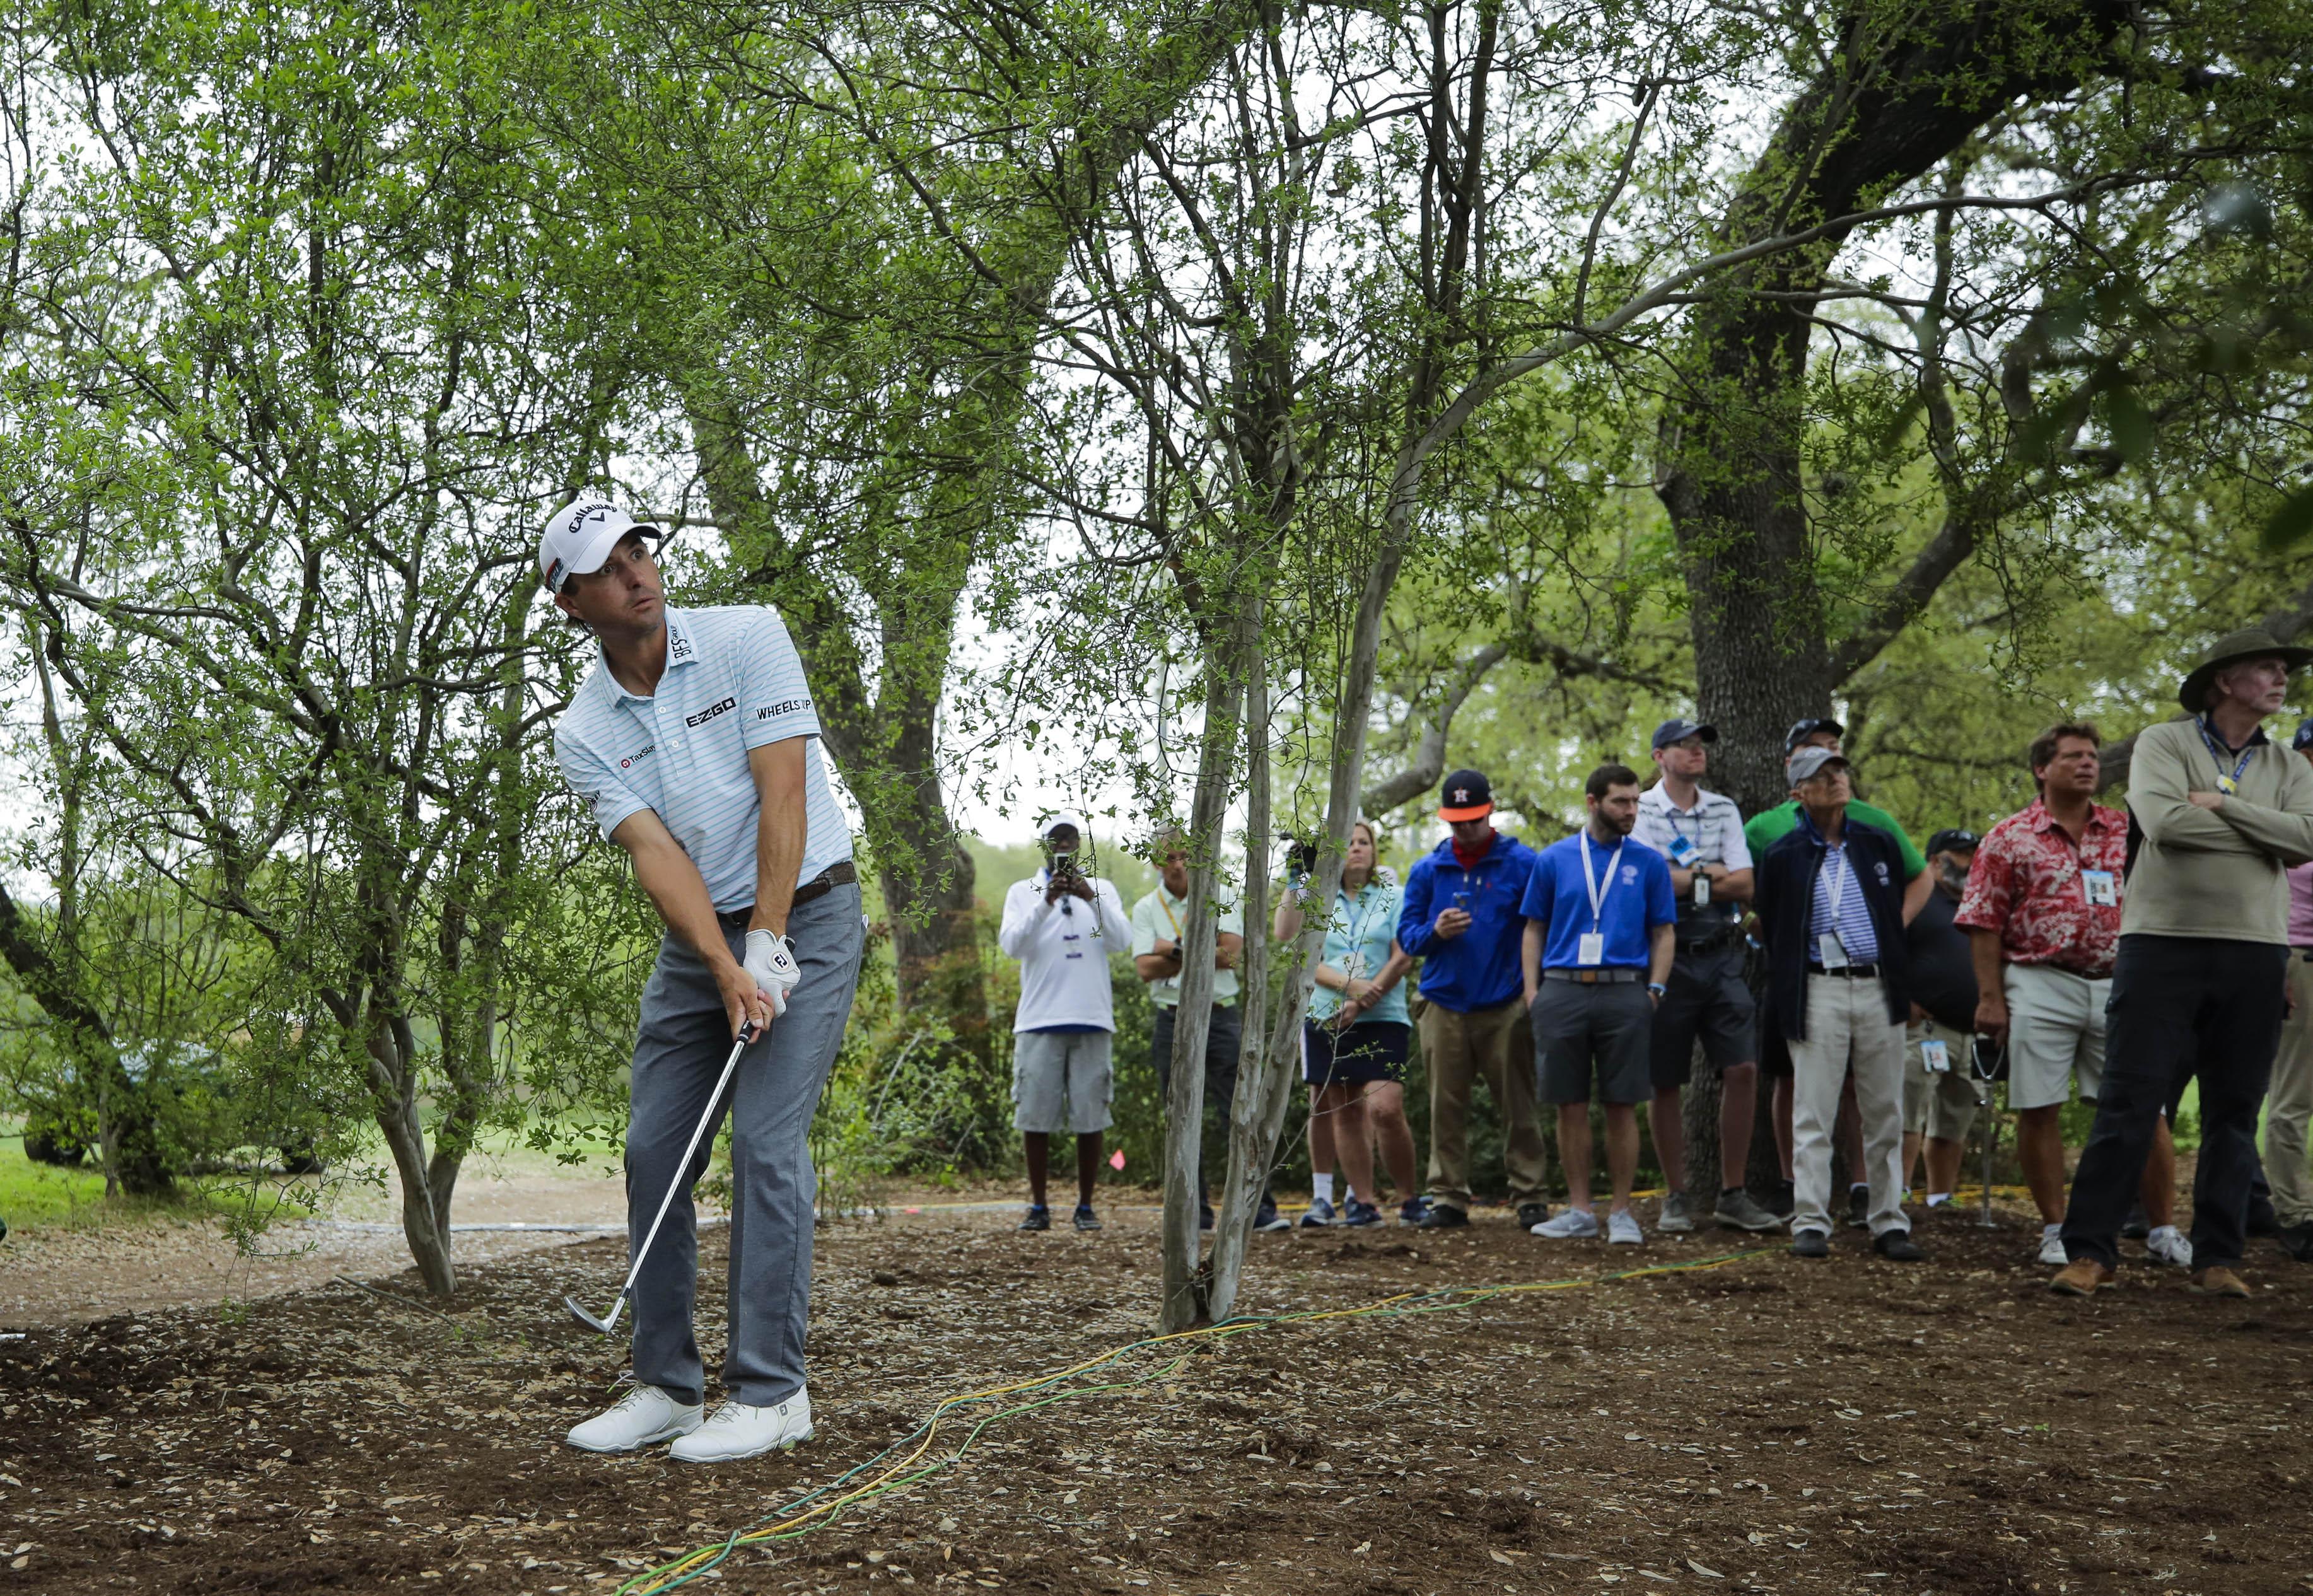 PGA: WGC - Dell Technologies Match Play - Final Round